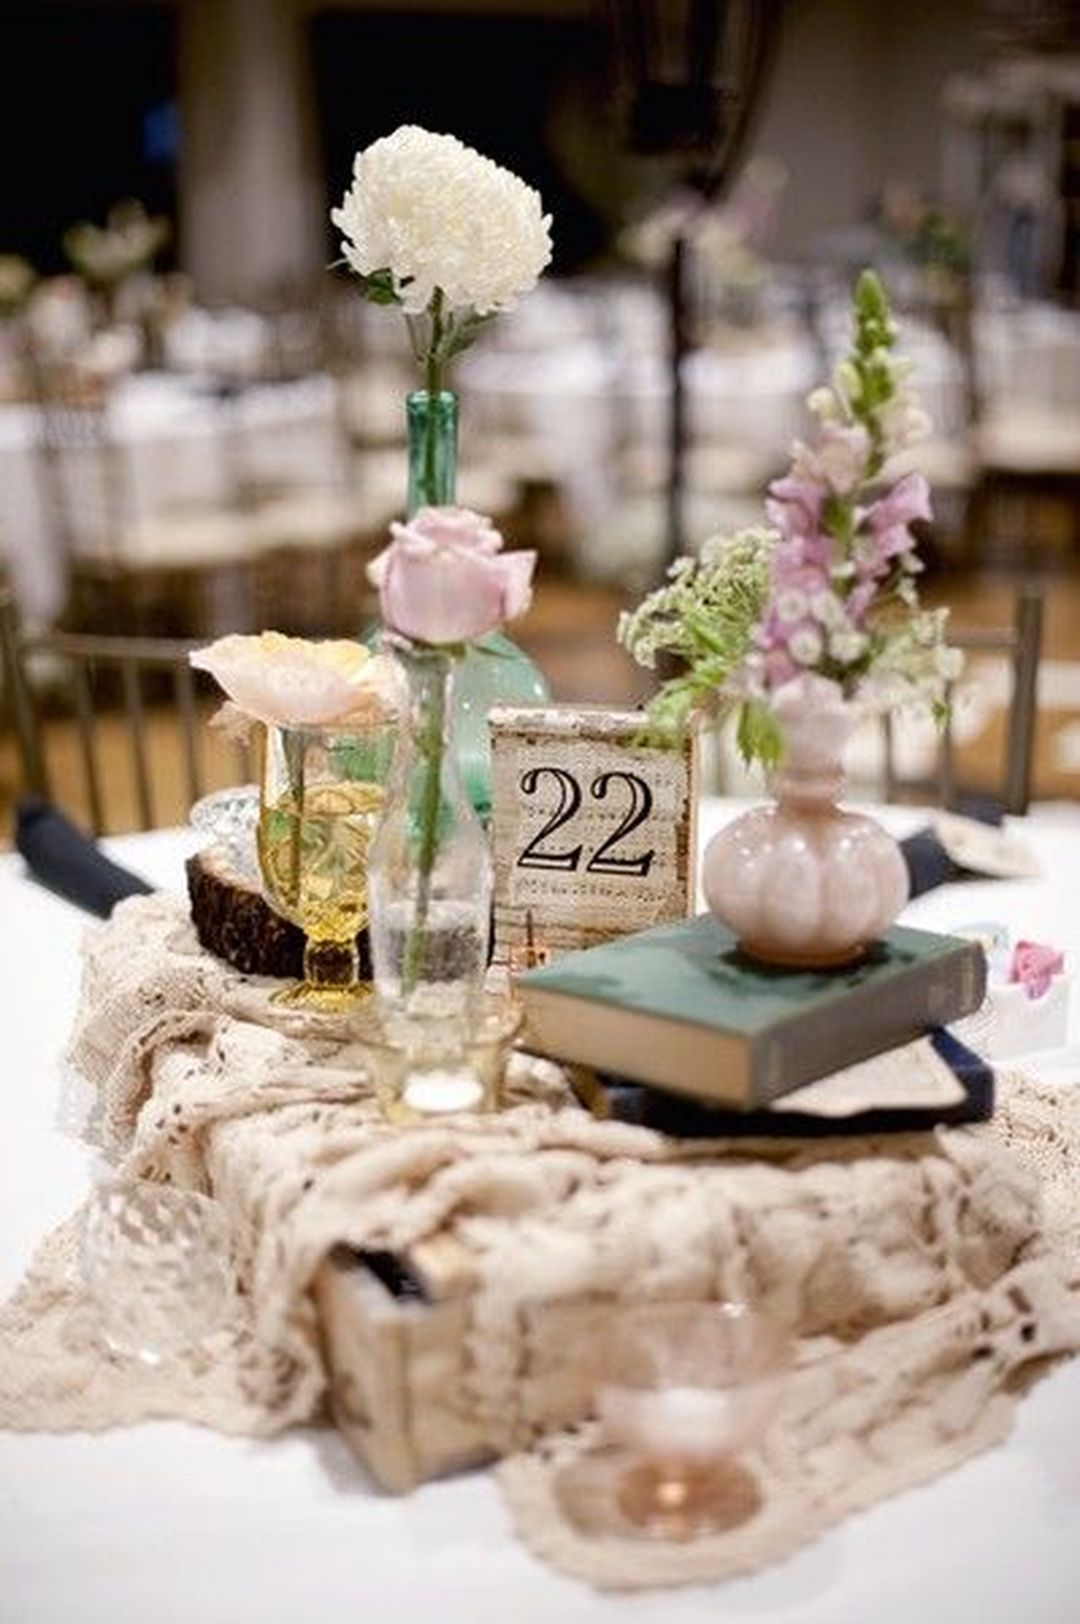 10 Beautiful Shabby Wedding Centerpieces Ideas Centerpieceideas Shabbyweddingcenterpieces In 2020 Shabby Chic Wedding Decor Shabby Chic Wedding Chic Wedding